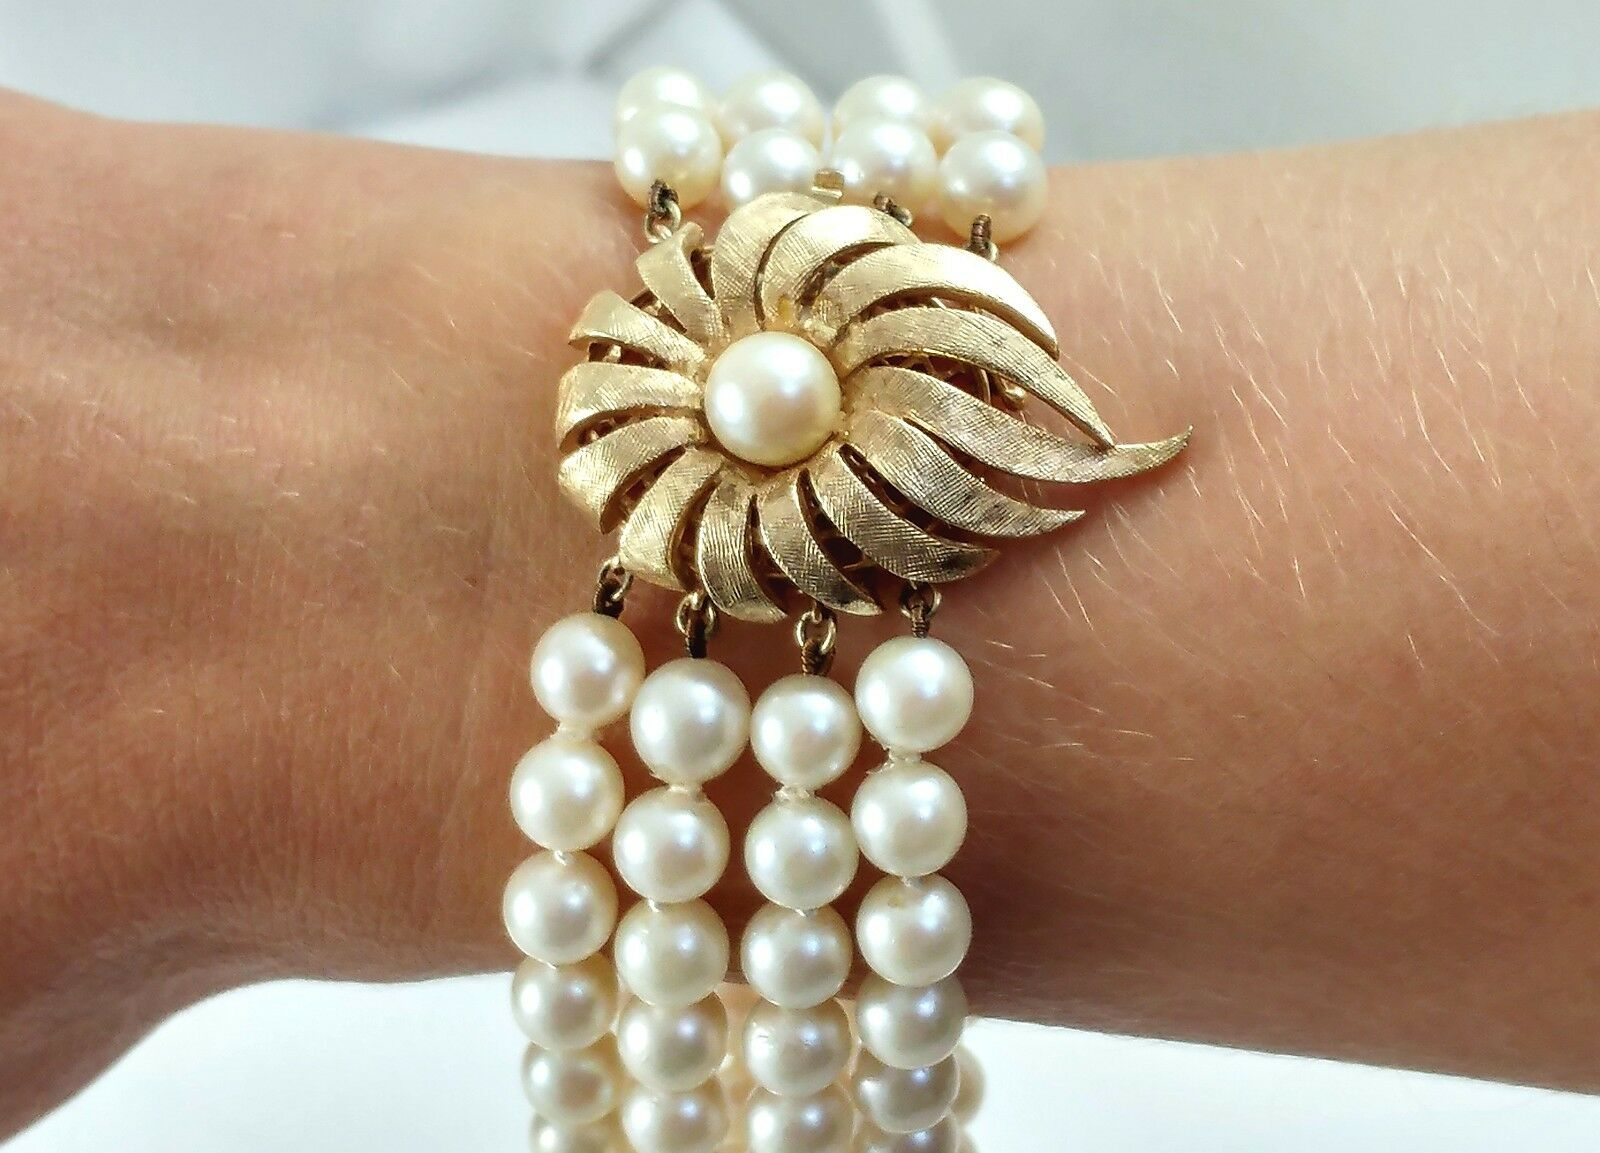 Bracciale perle quattro quattro quattro RIGA mozzafiato 14 CT oro 8  Long VINTAGE SIMPSONS USA IN SCATOLA b0c6f7